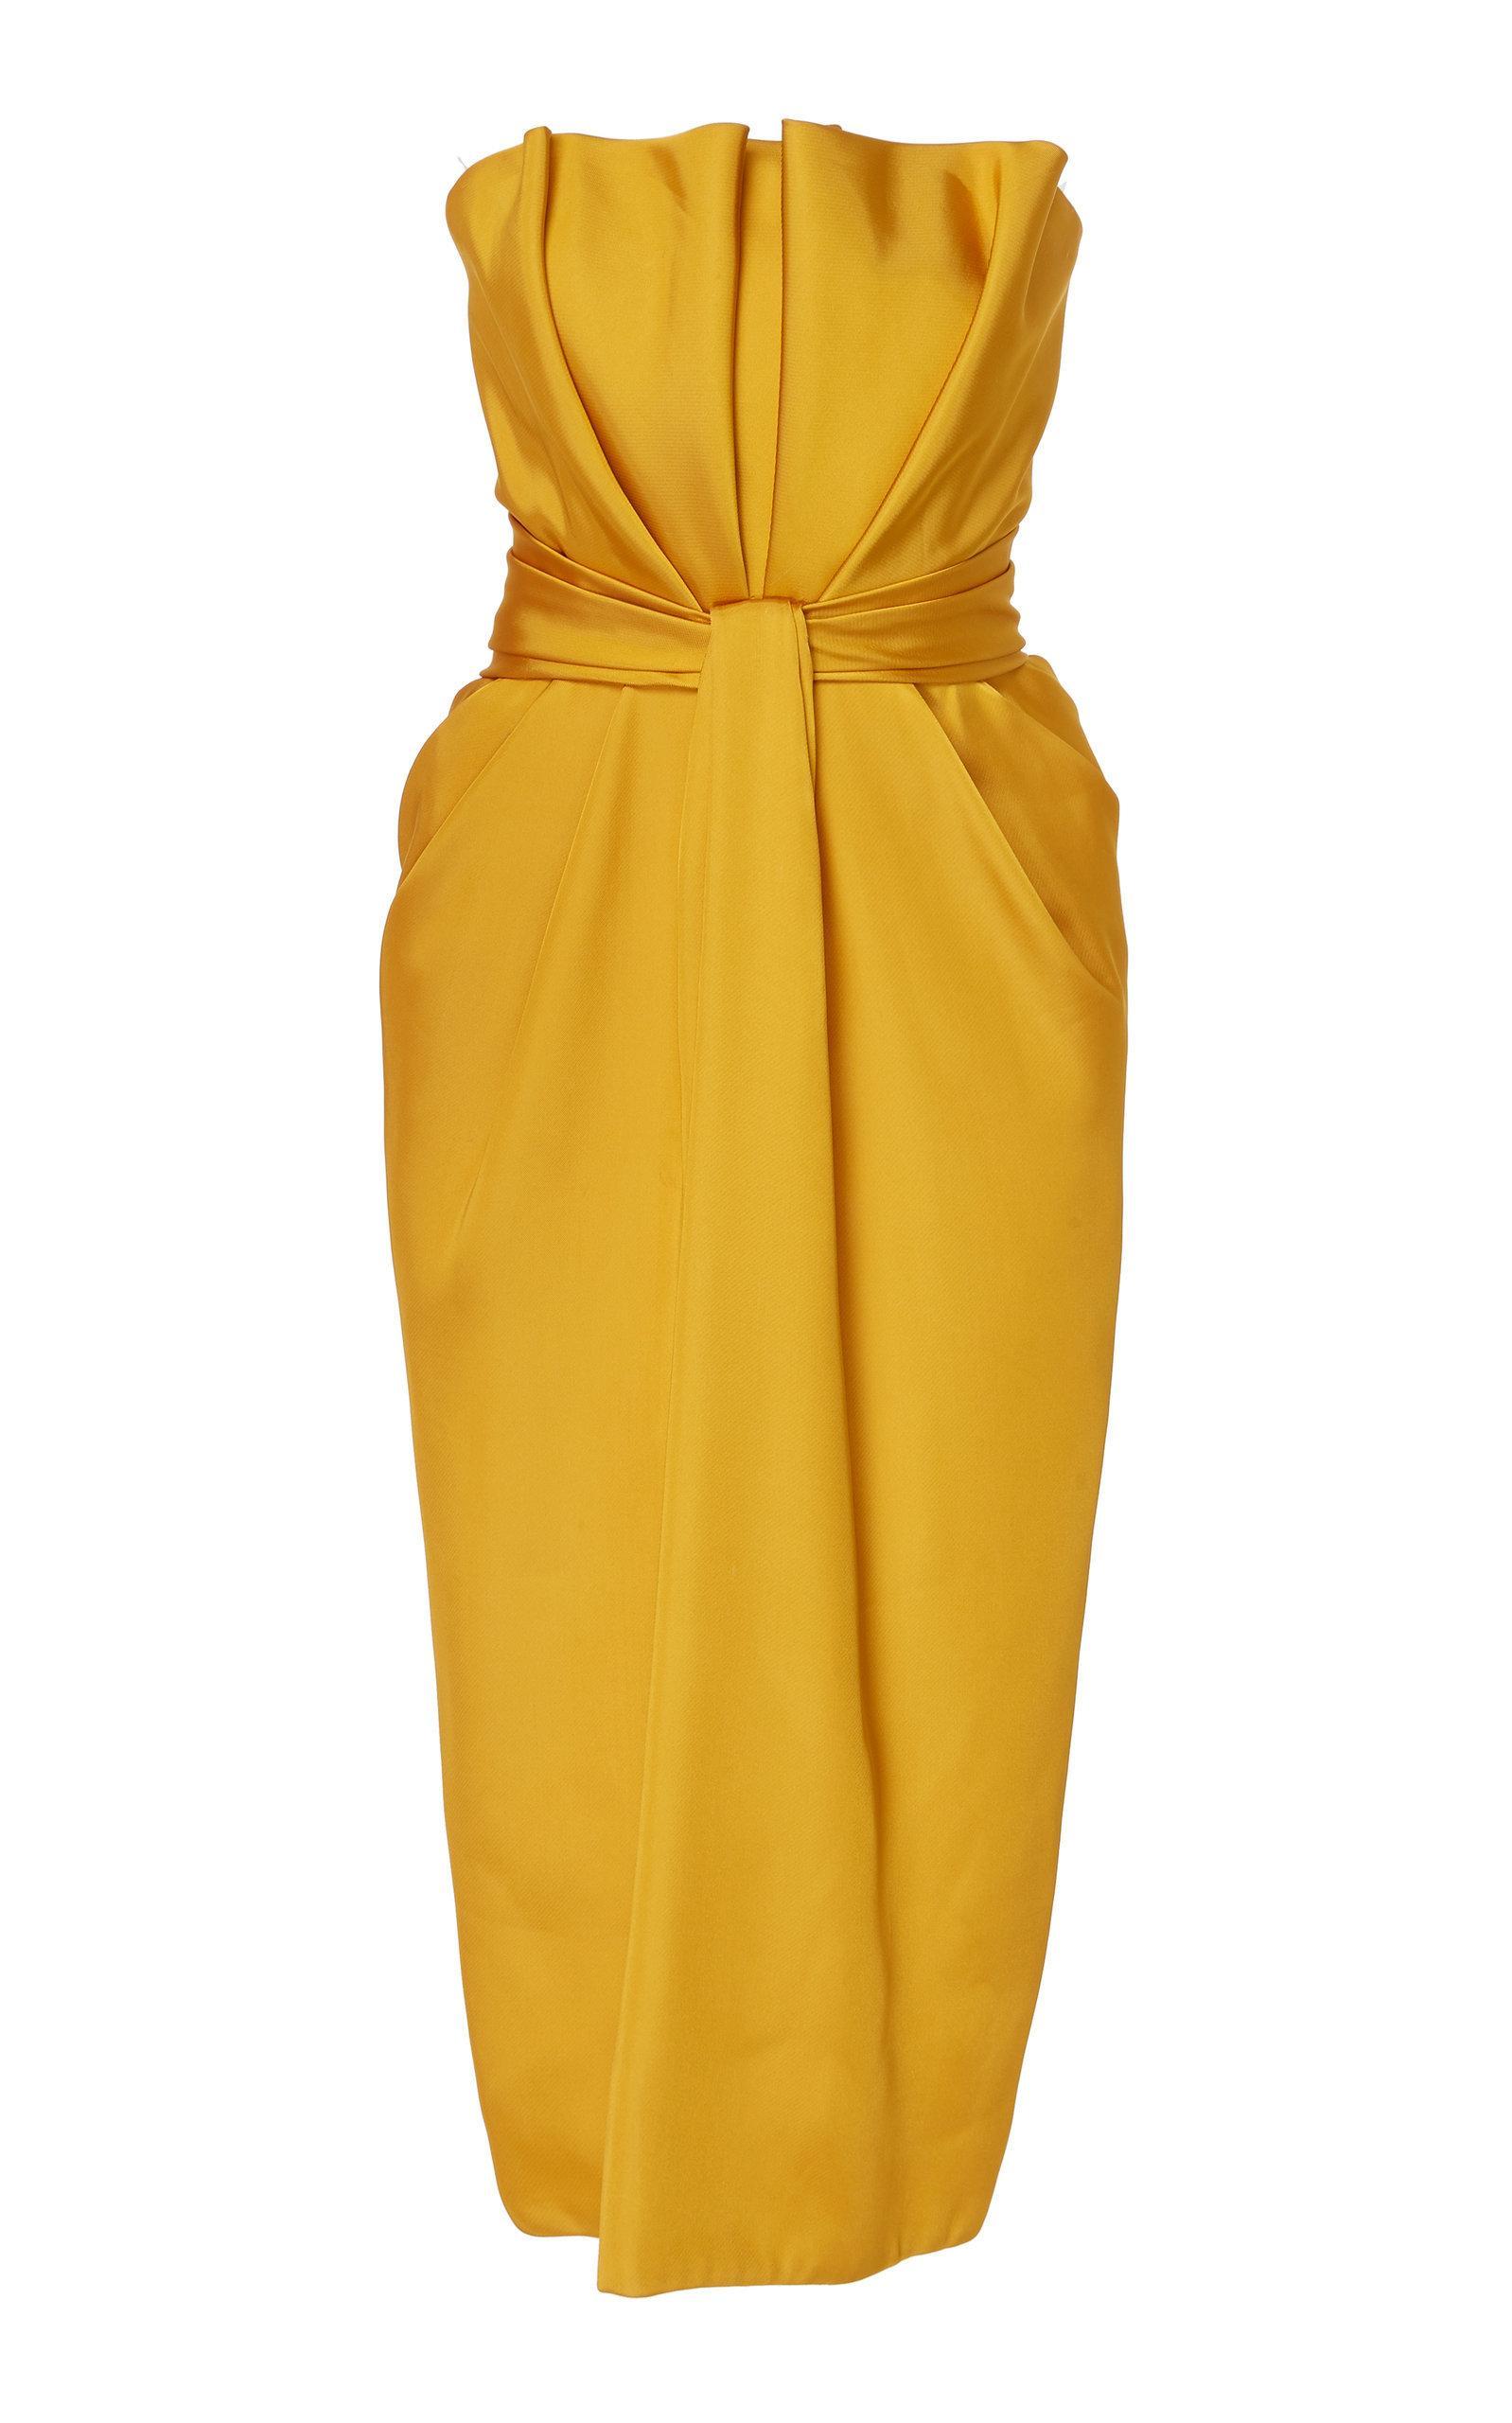 5f6bd1185b1 Brandon Maxwell Petal Front Satin Cocktail Dress In Yellow. Moda Operandi